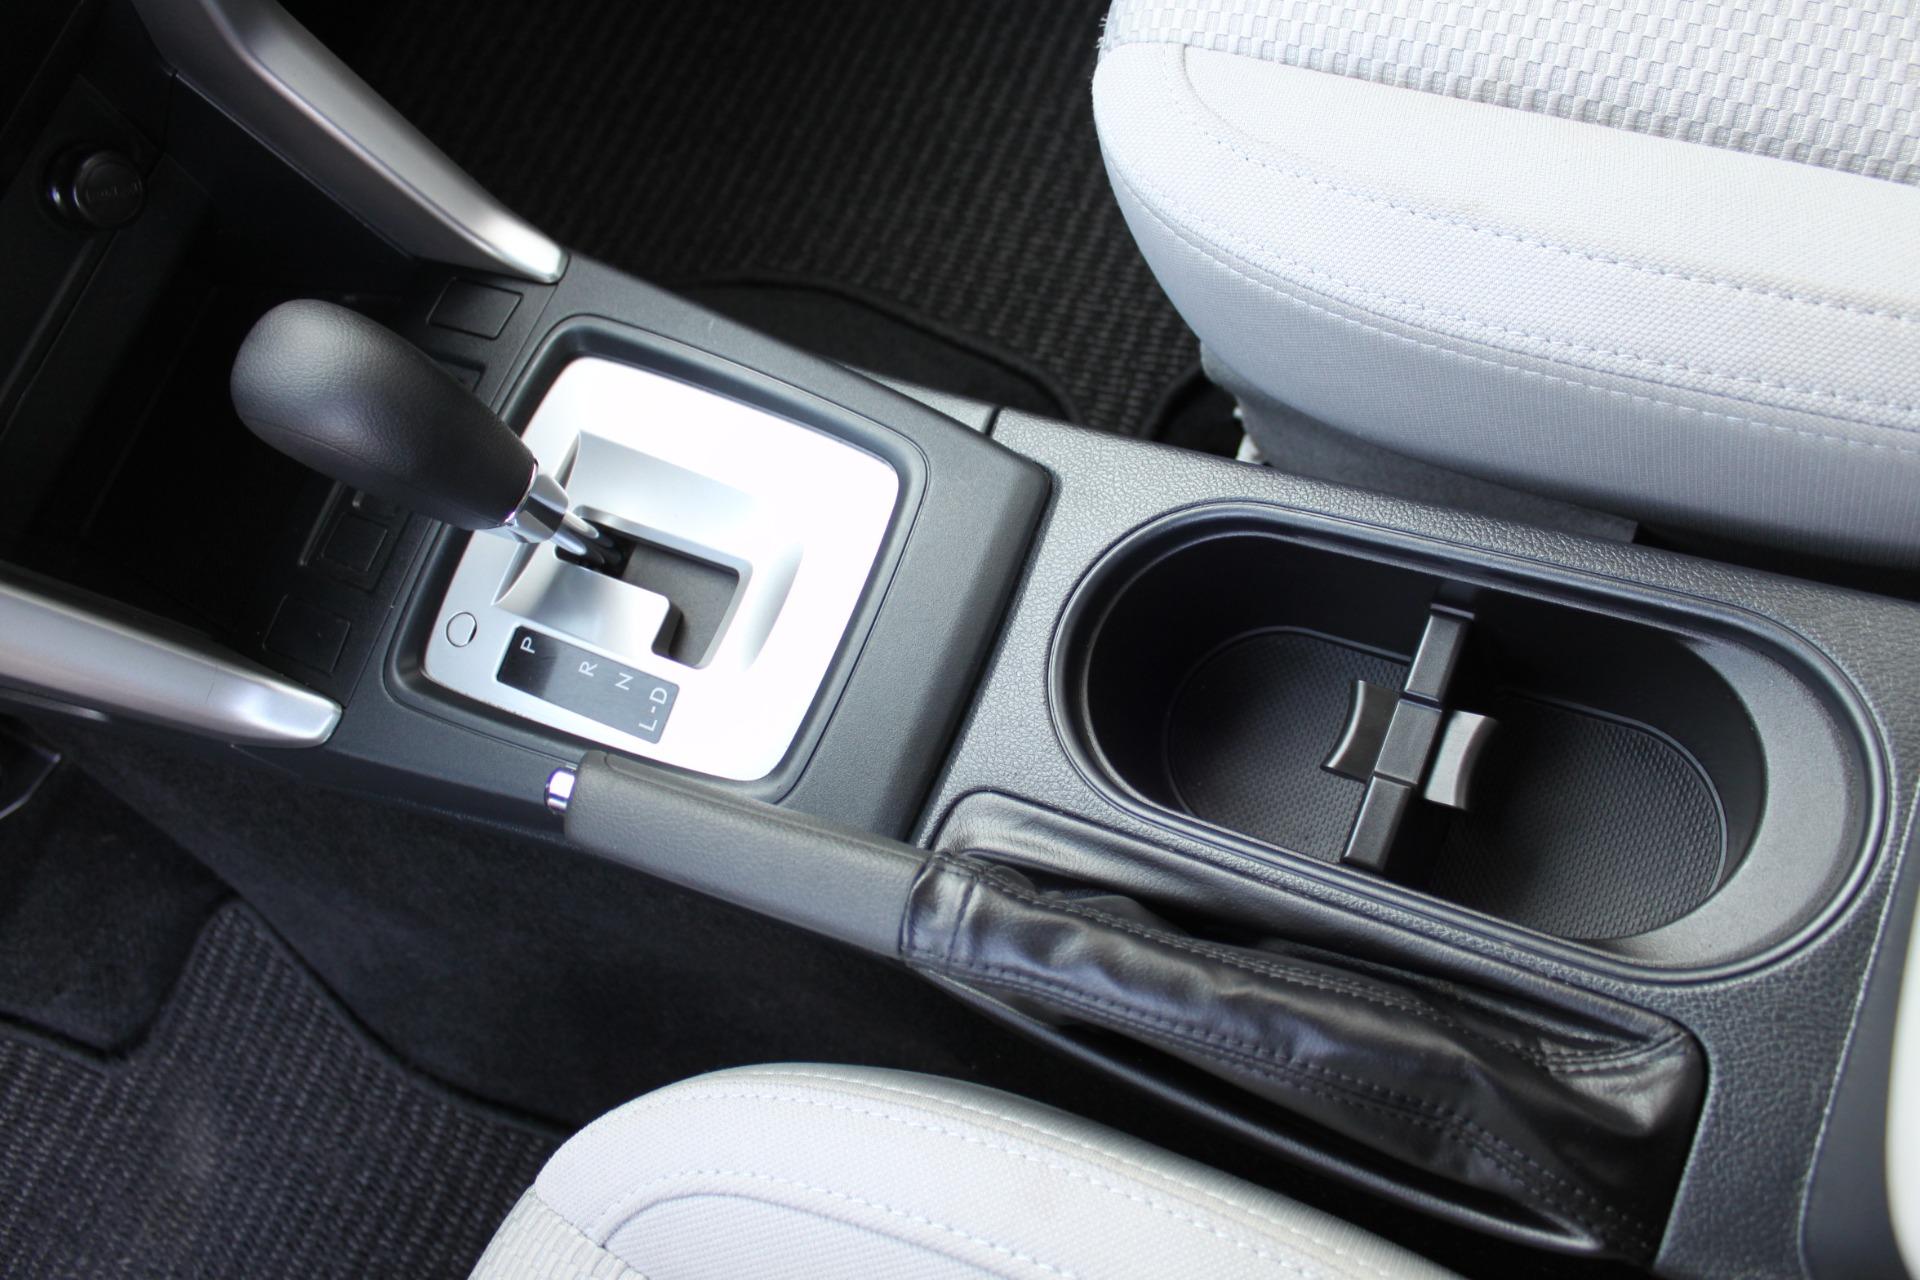 Used-2017-Subaru-Forester-25i-All-Wheel-Drive-25i-vintage